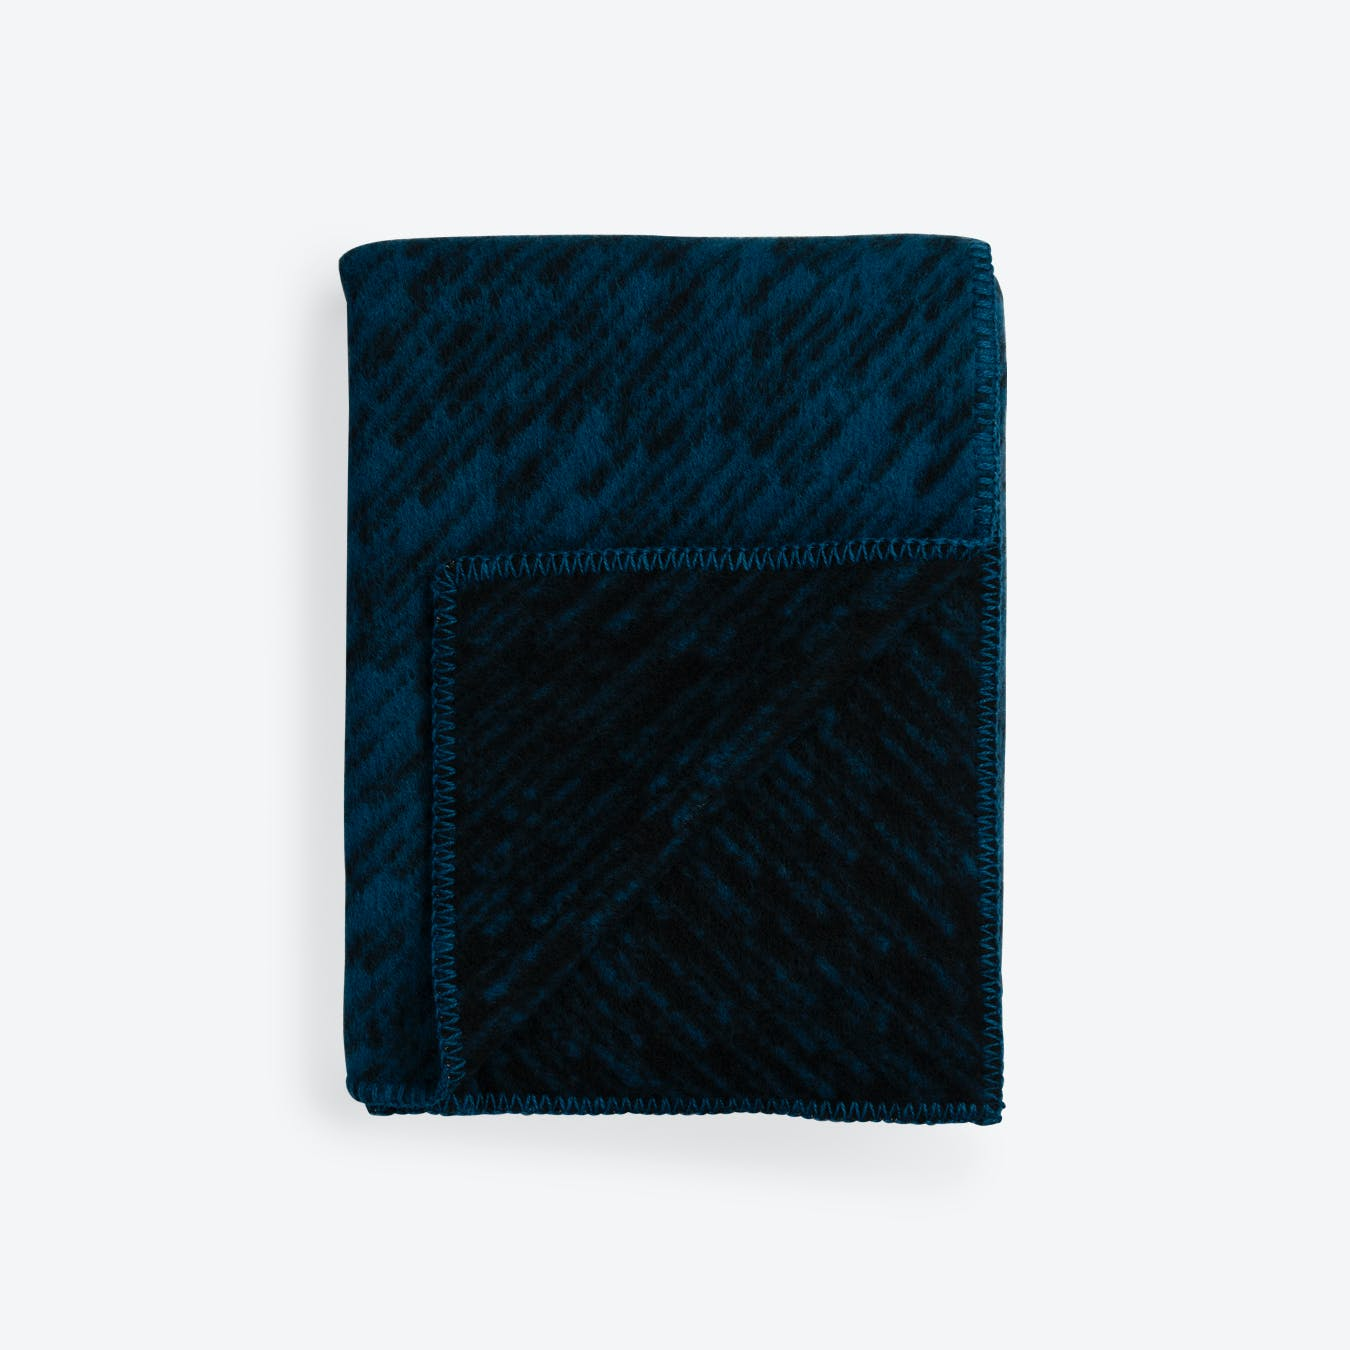 Giboulèe Lambswool Rug in Black/Blue